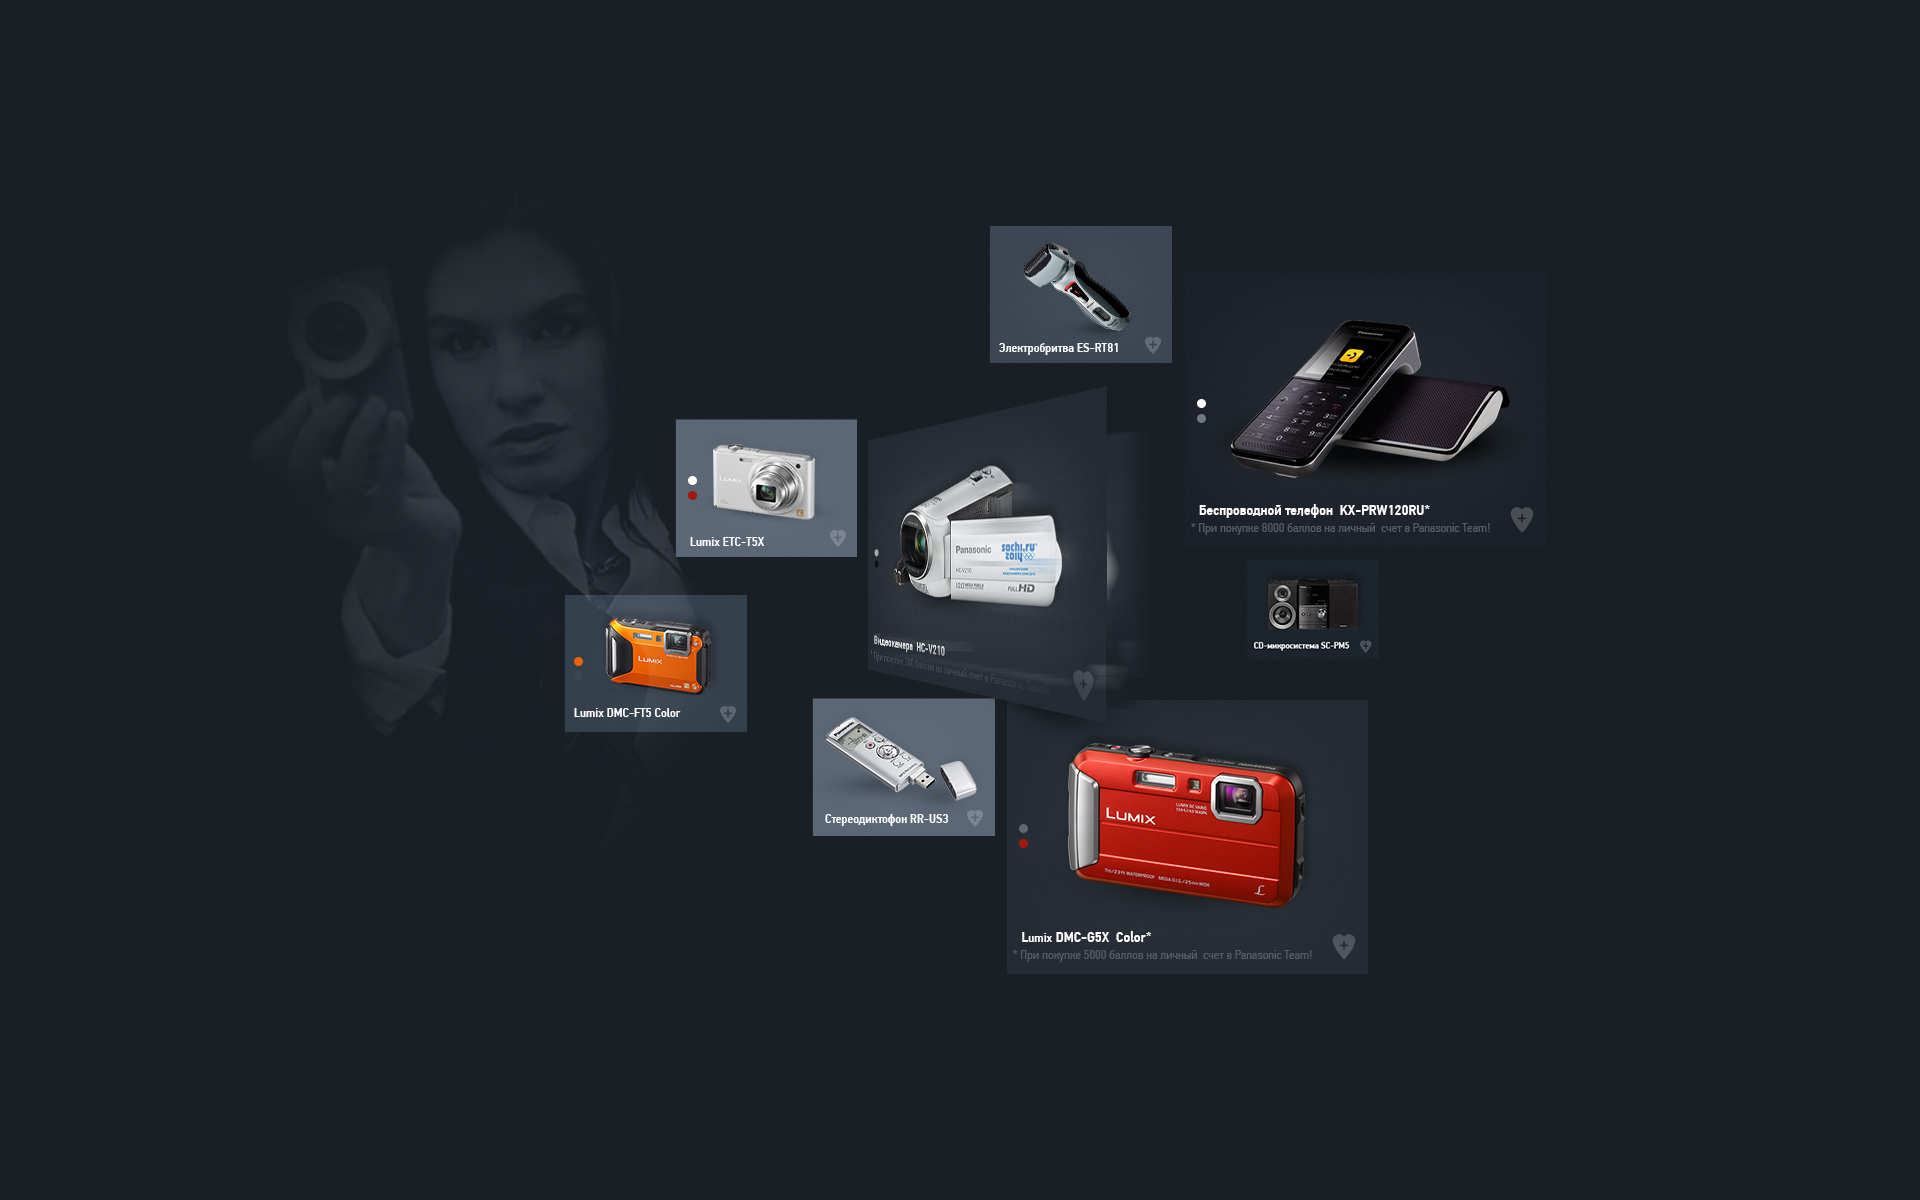 Panasonic Team user interface kit.